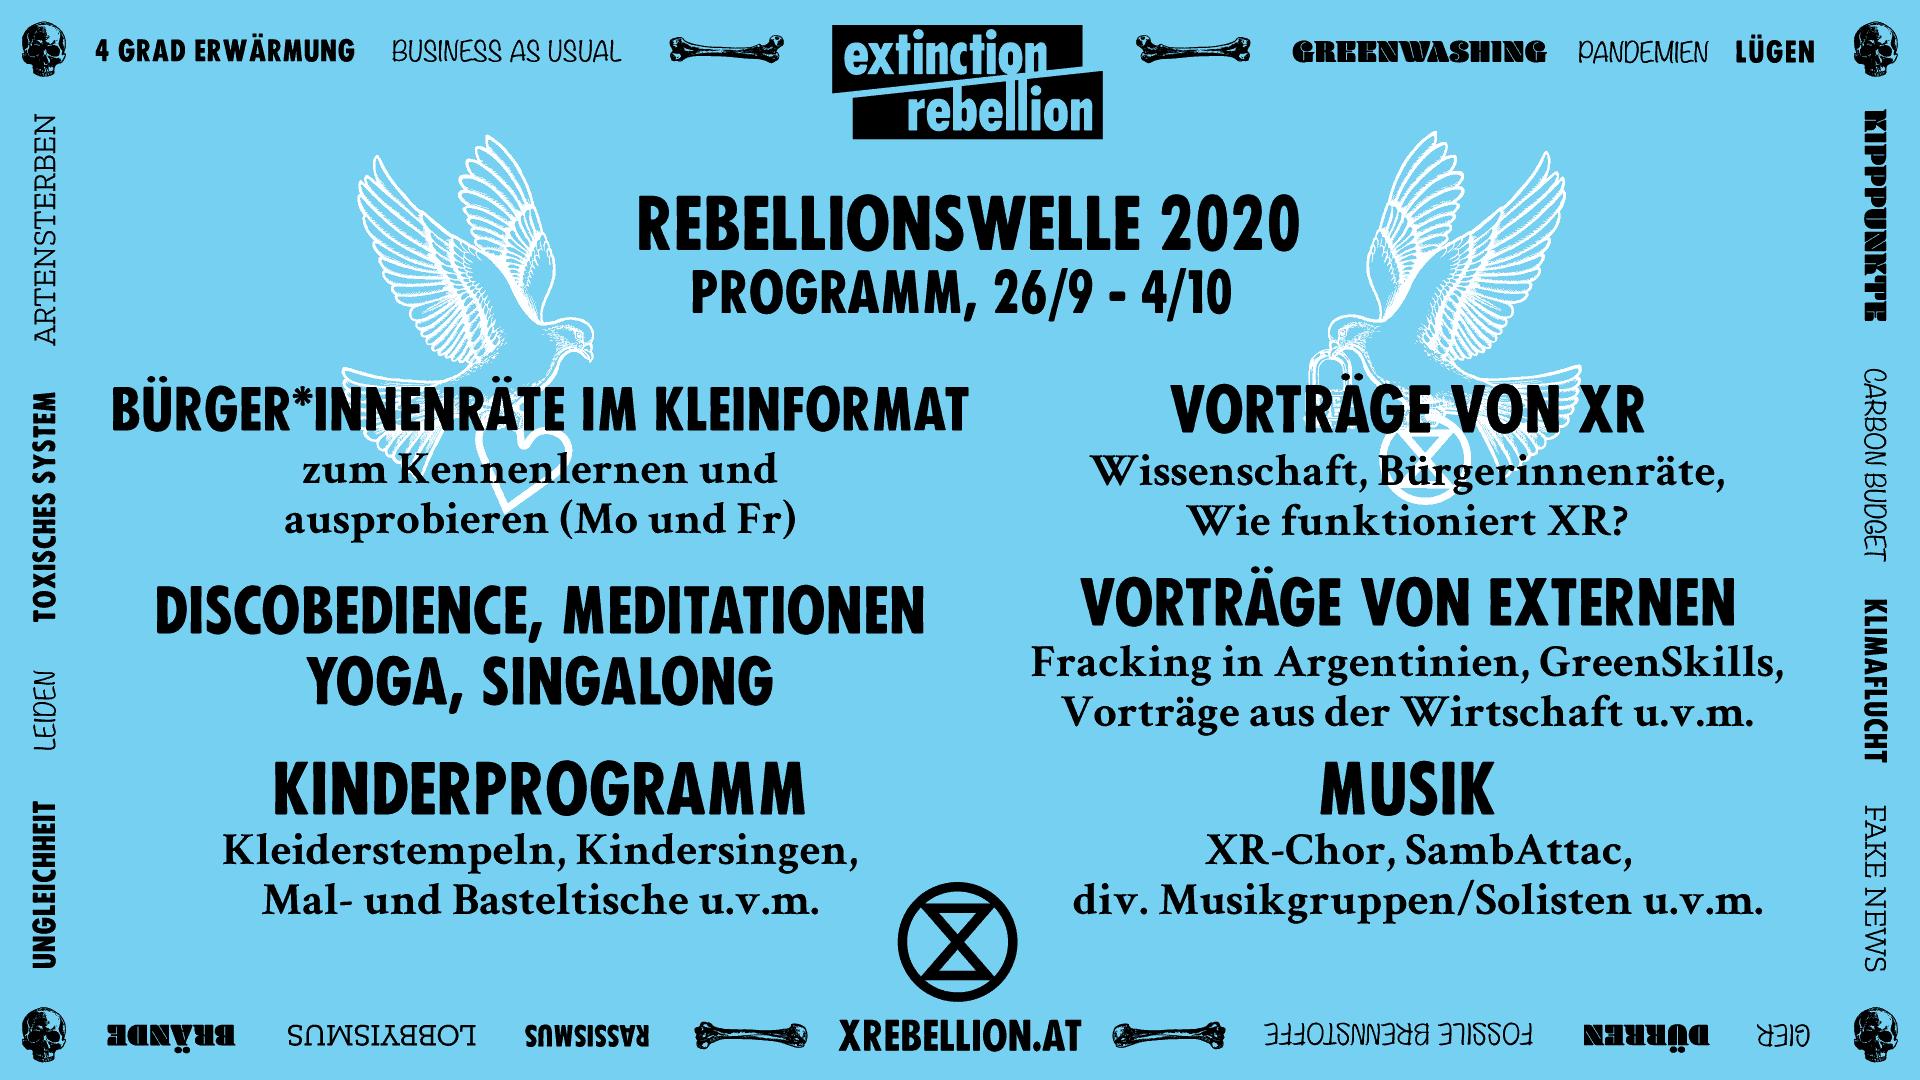 Rebellionswelle Programm